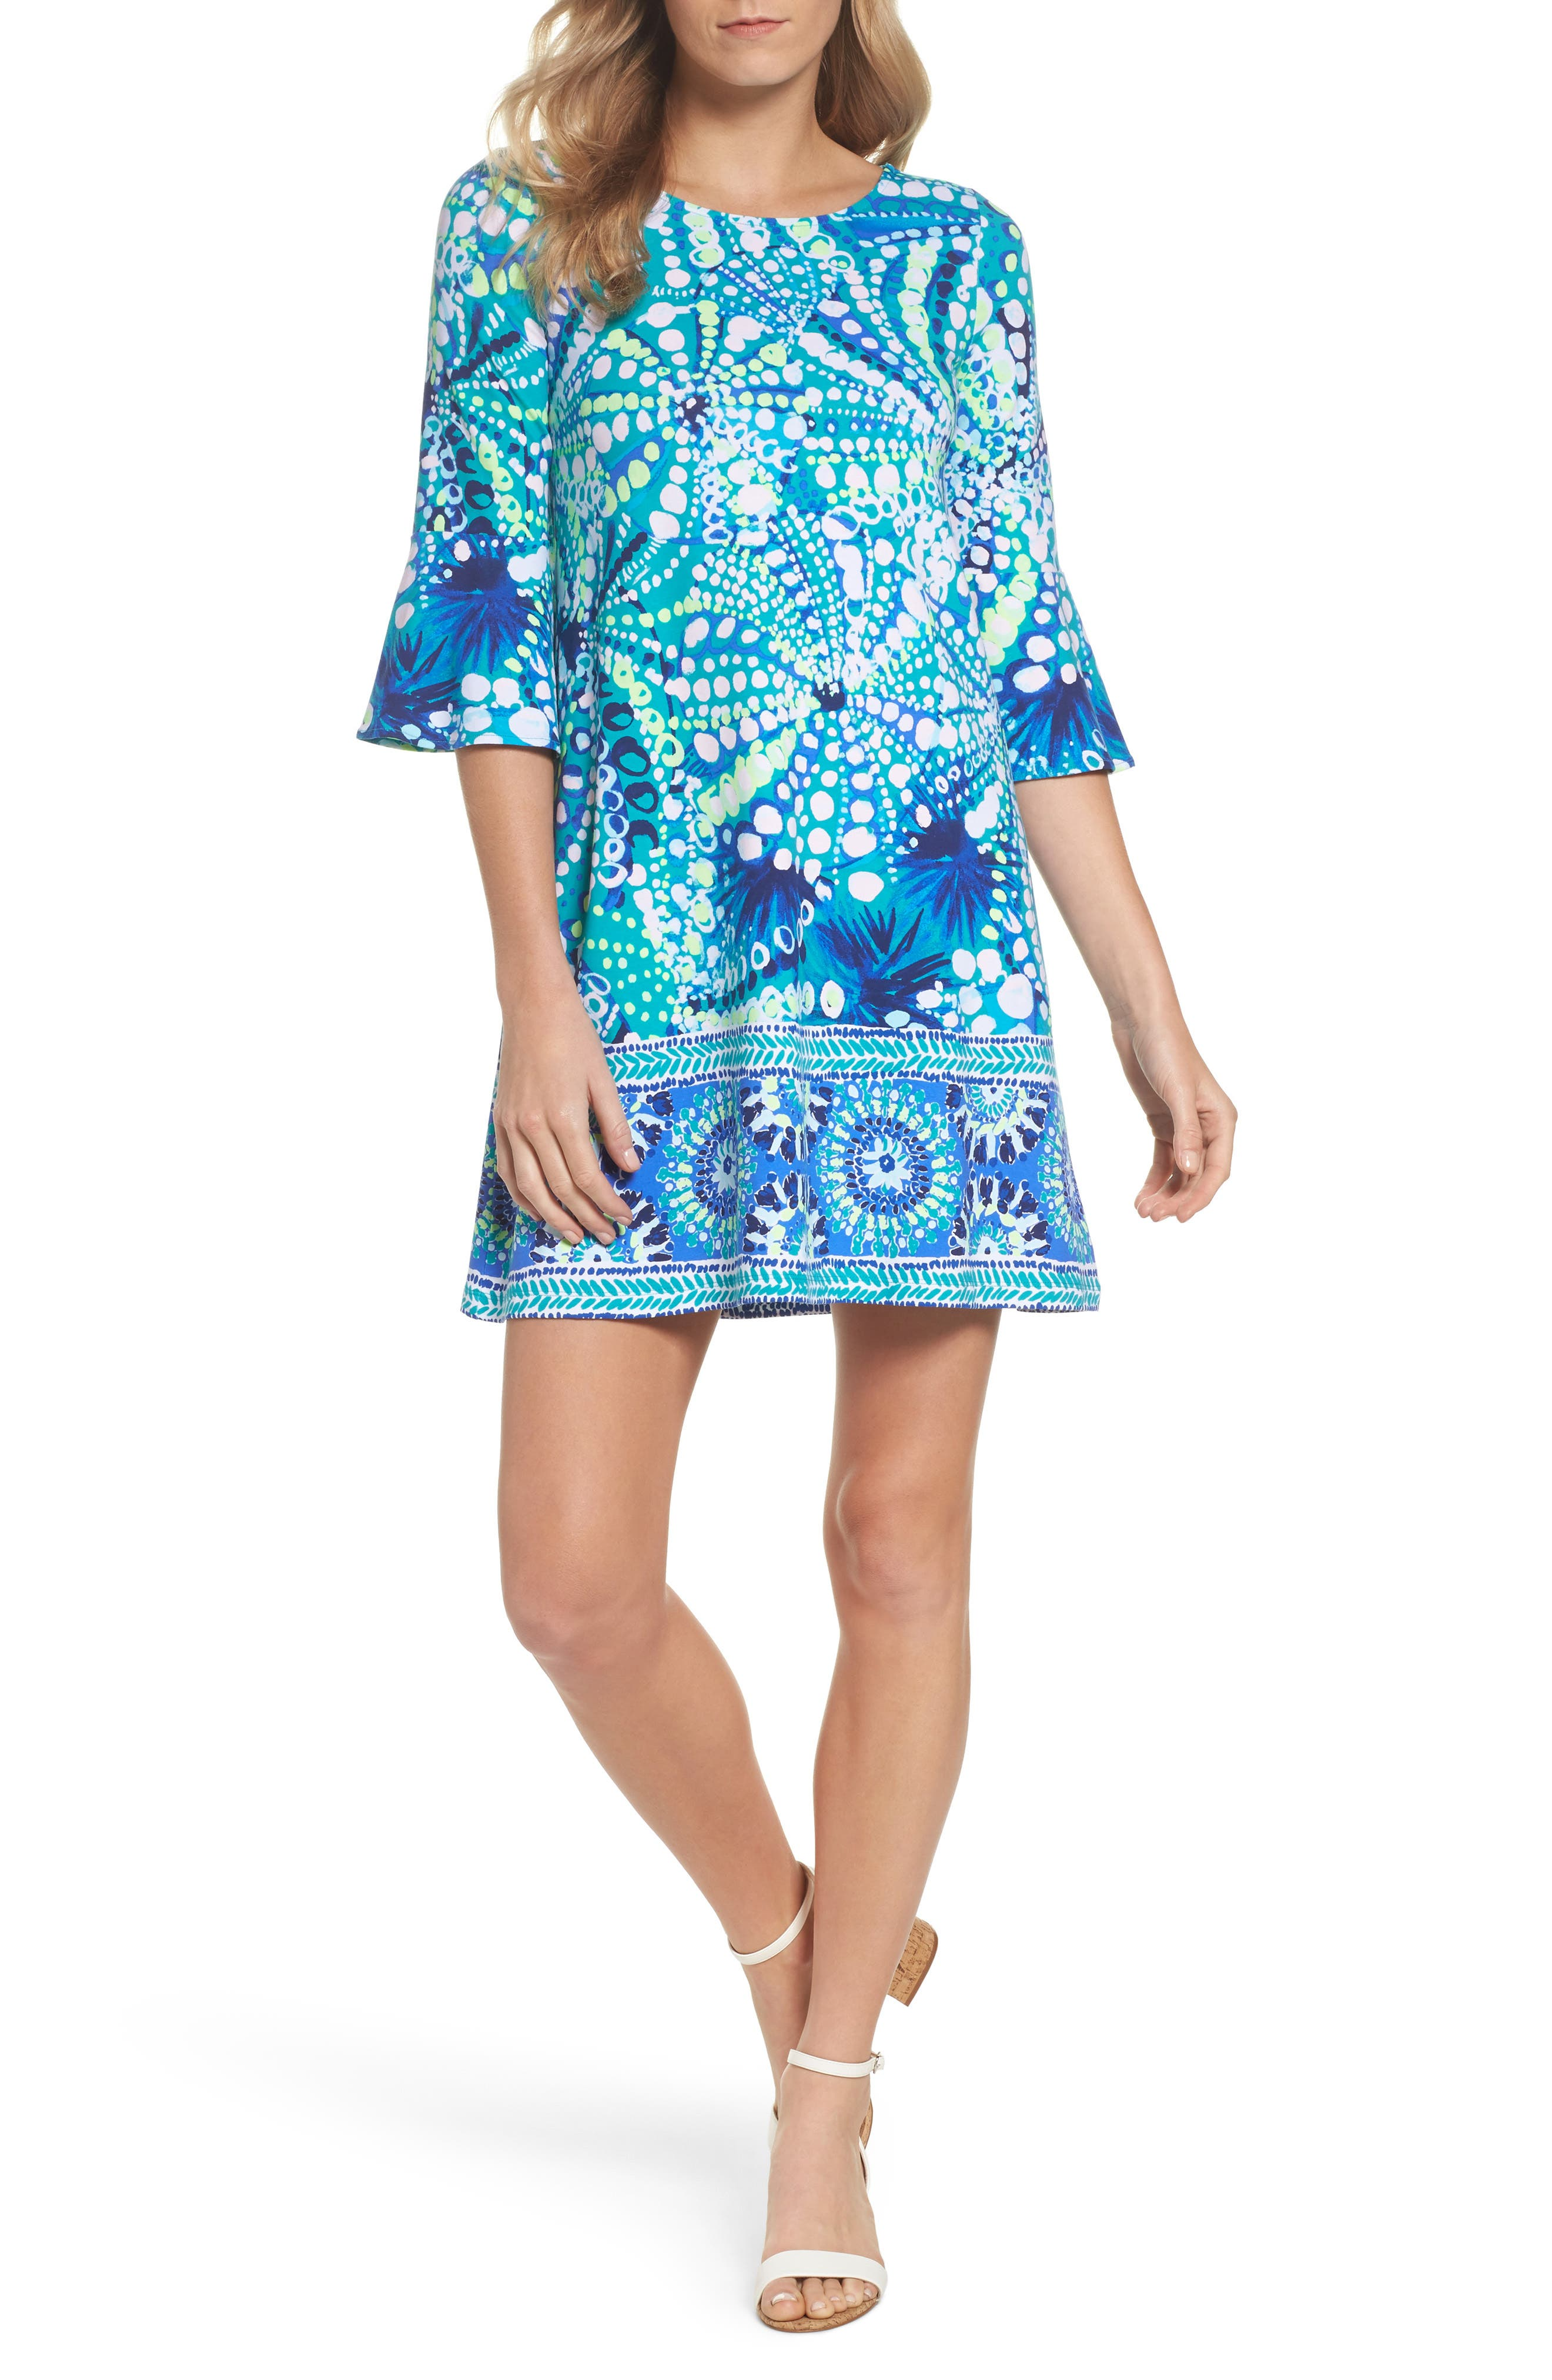 Ophelia Swing Dress,                         Main,                         color, 391